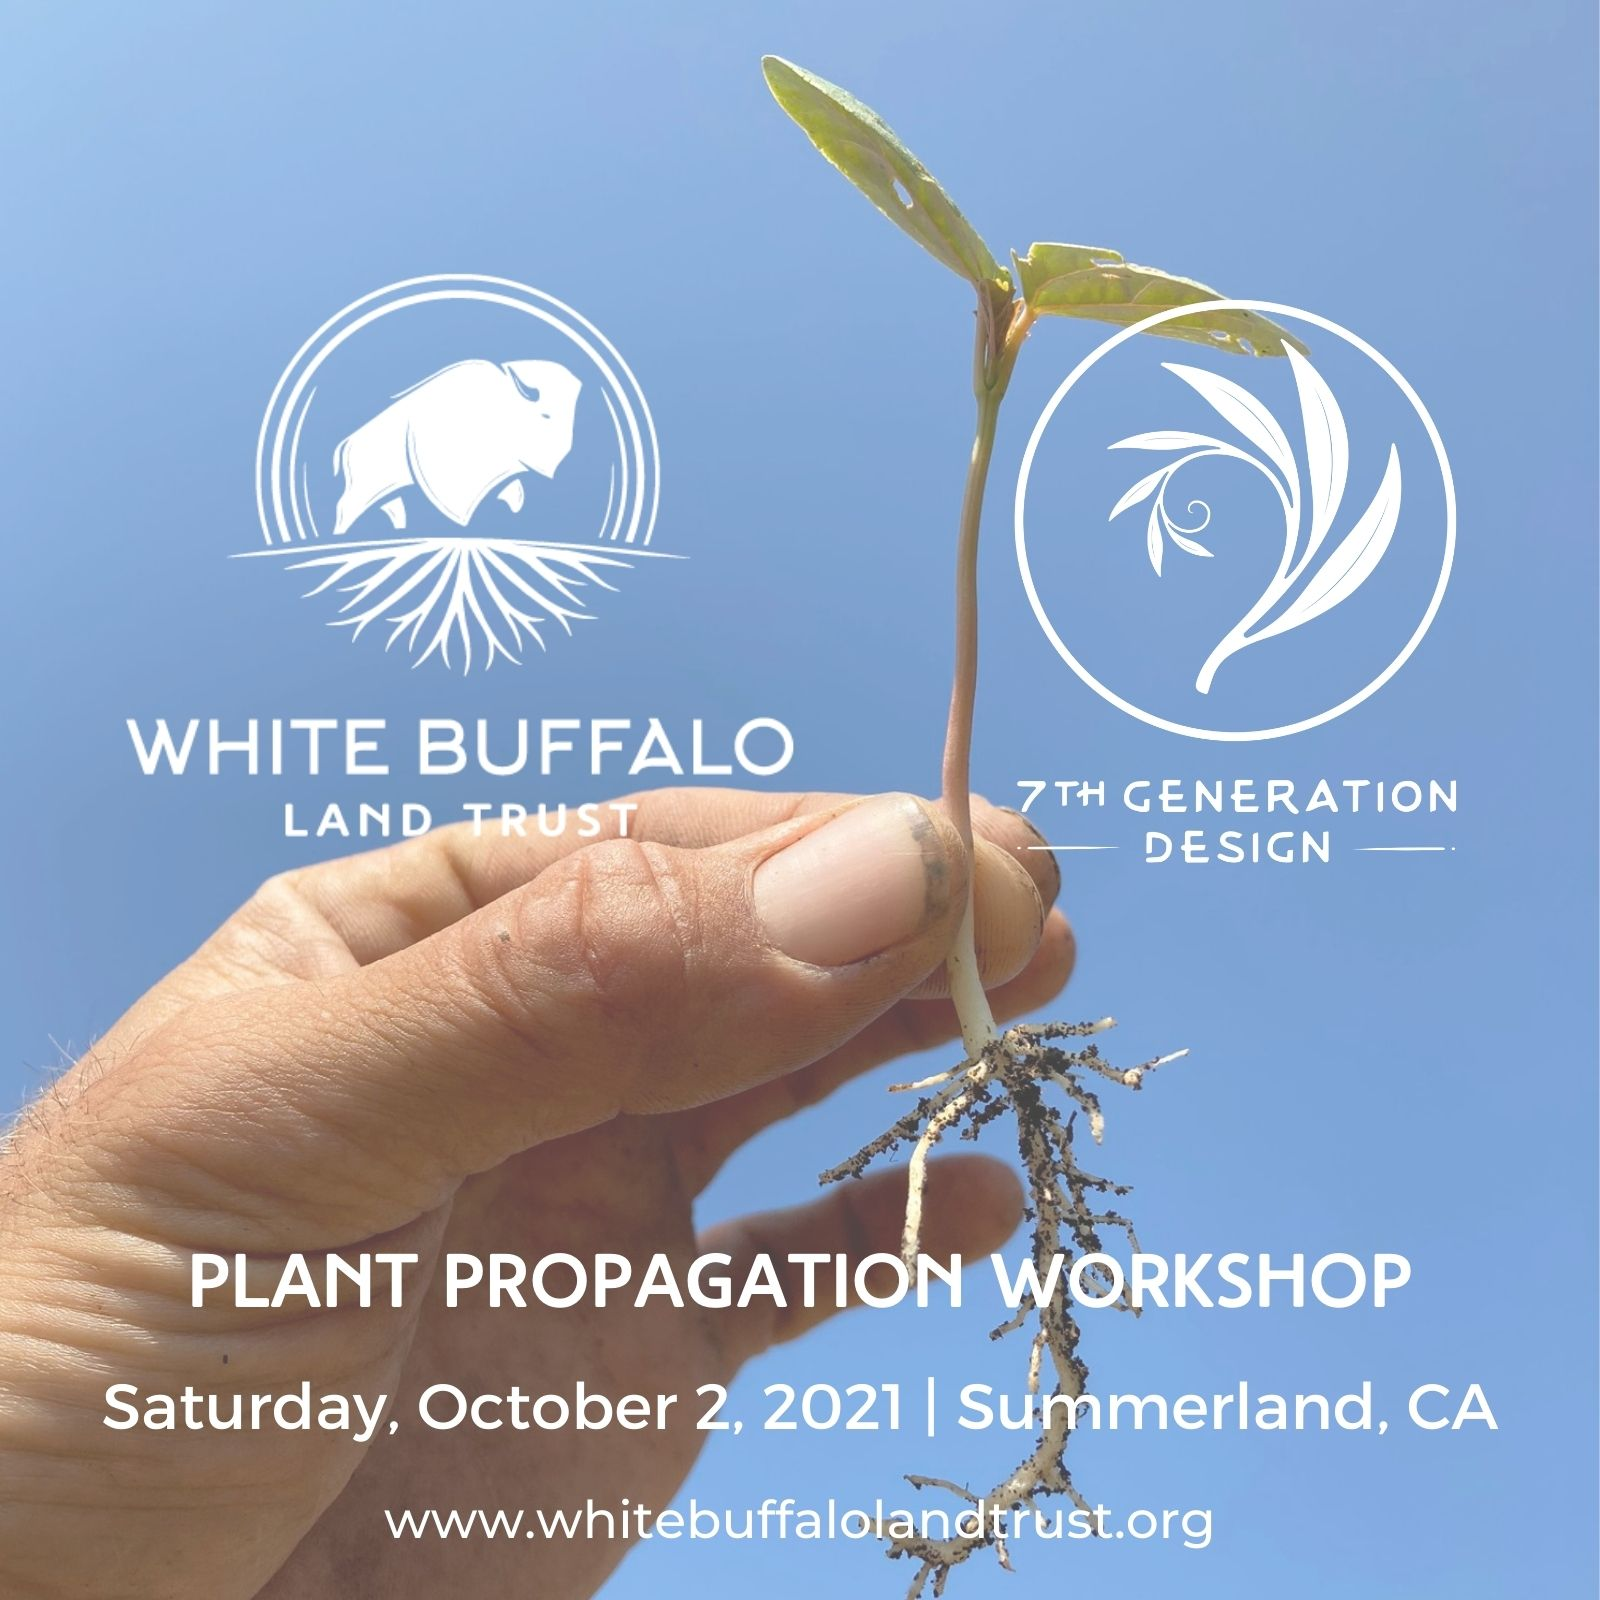 Plant Propagation Workshop at White Buffalo Land Trust  title=